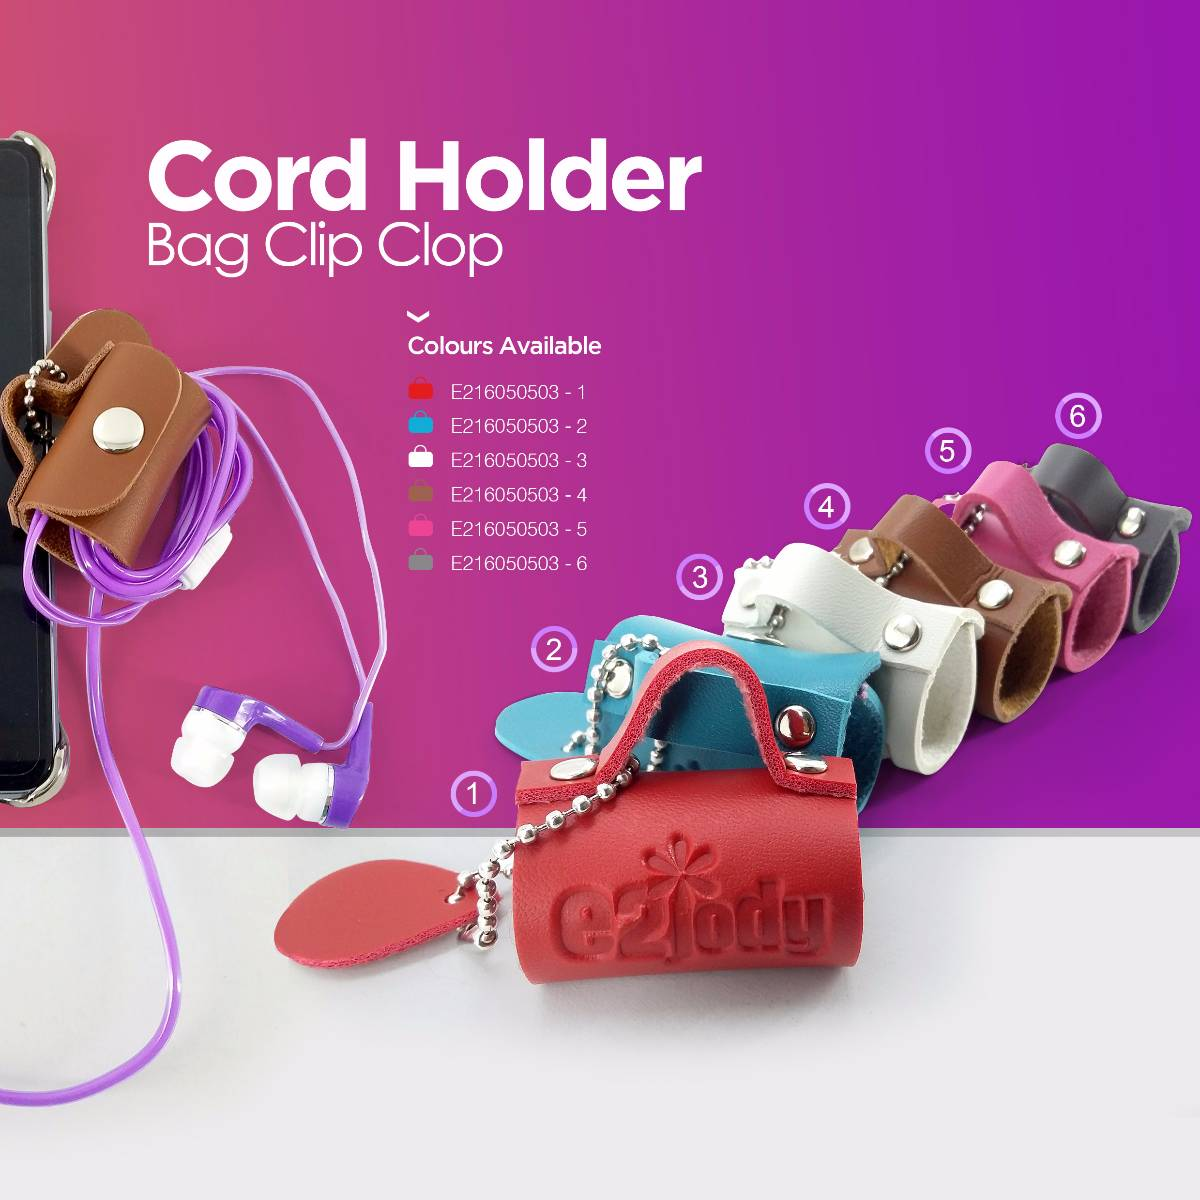 Cord Holder Bag